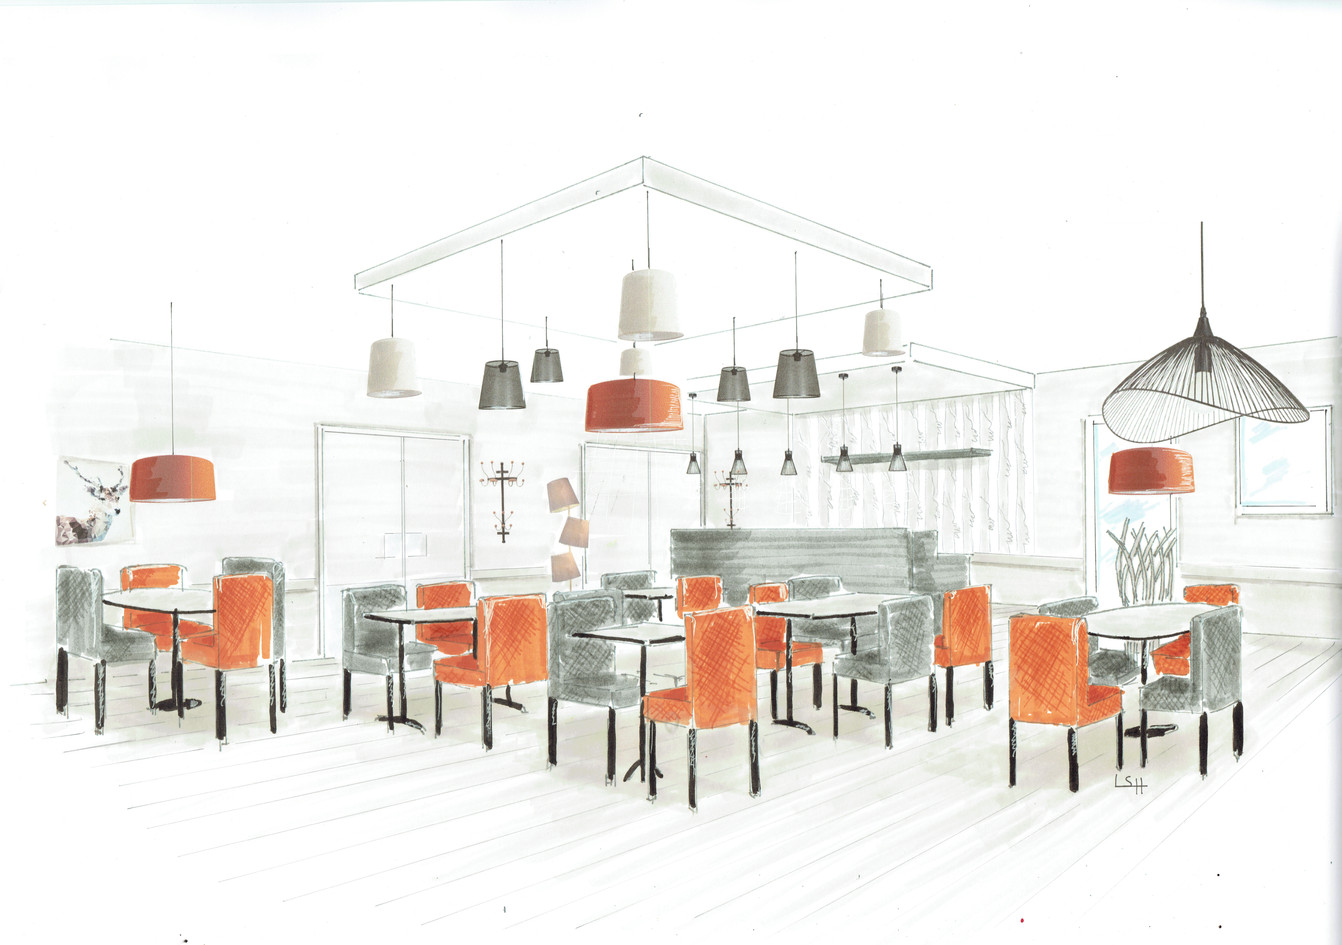 Agencement d'un restaurant d'application